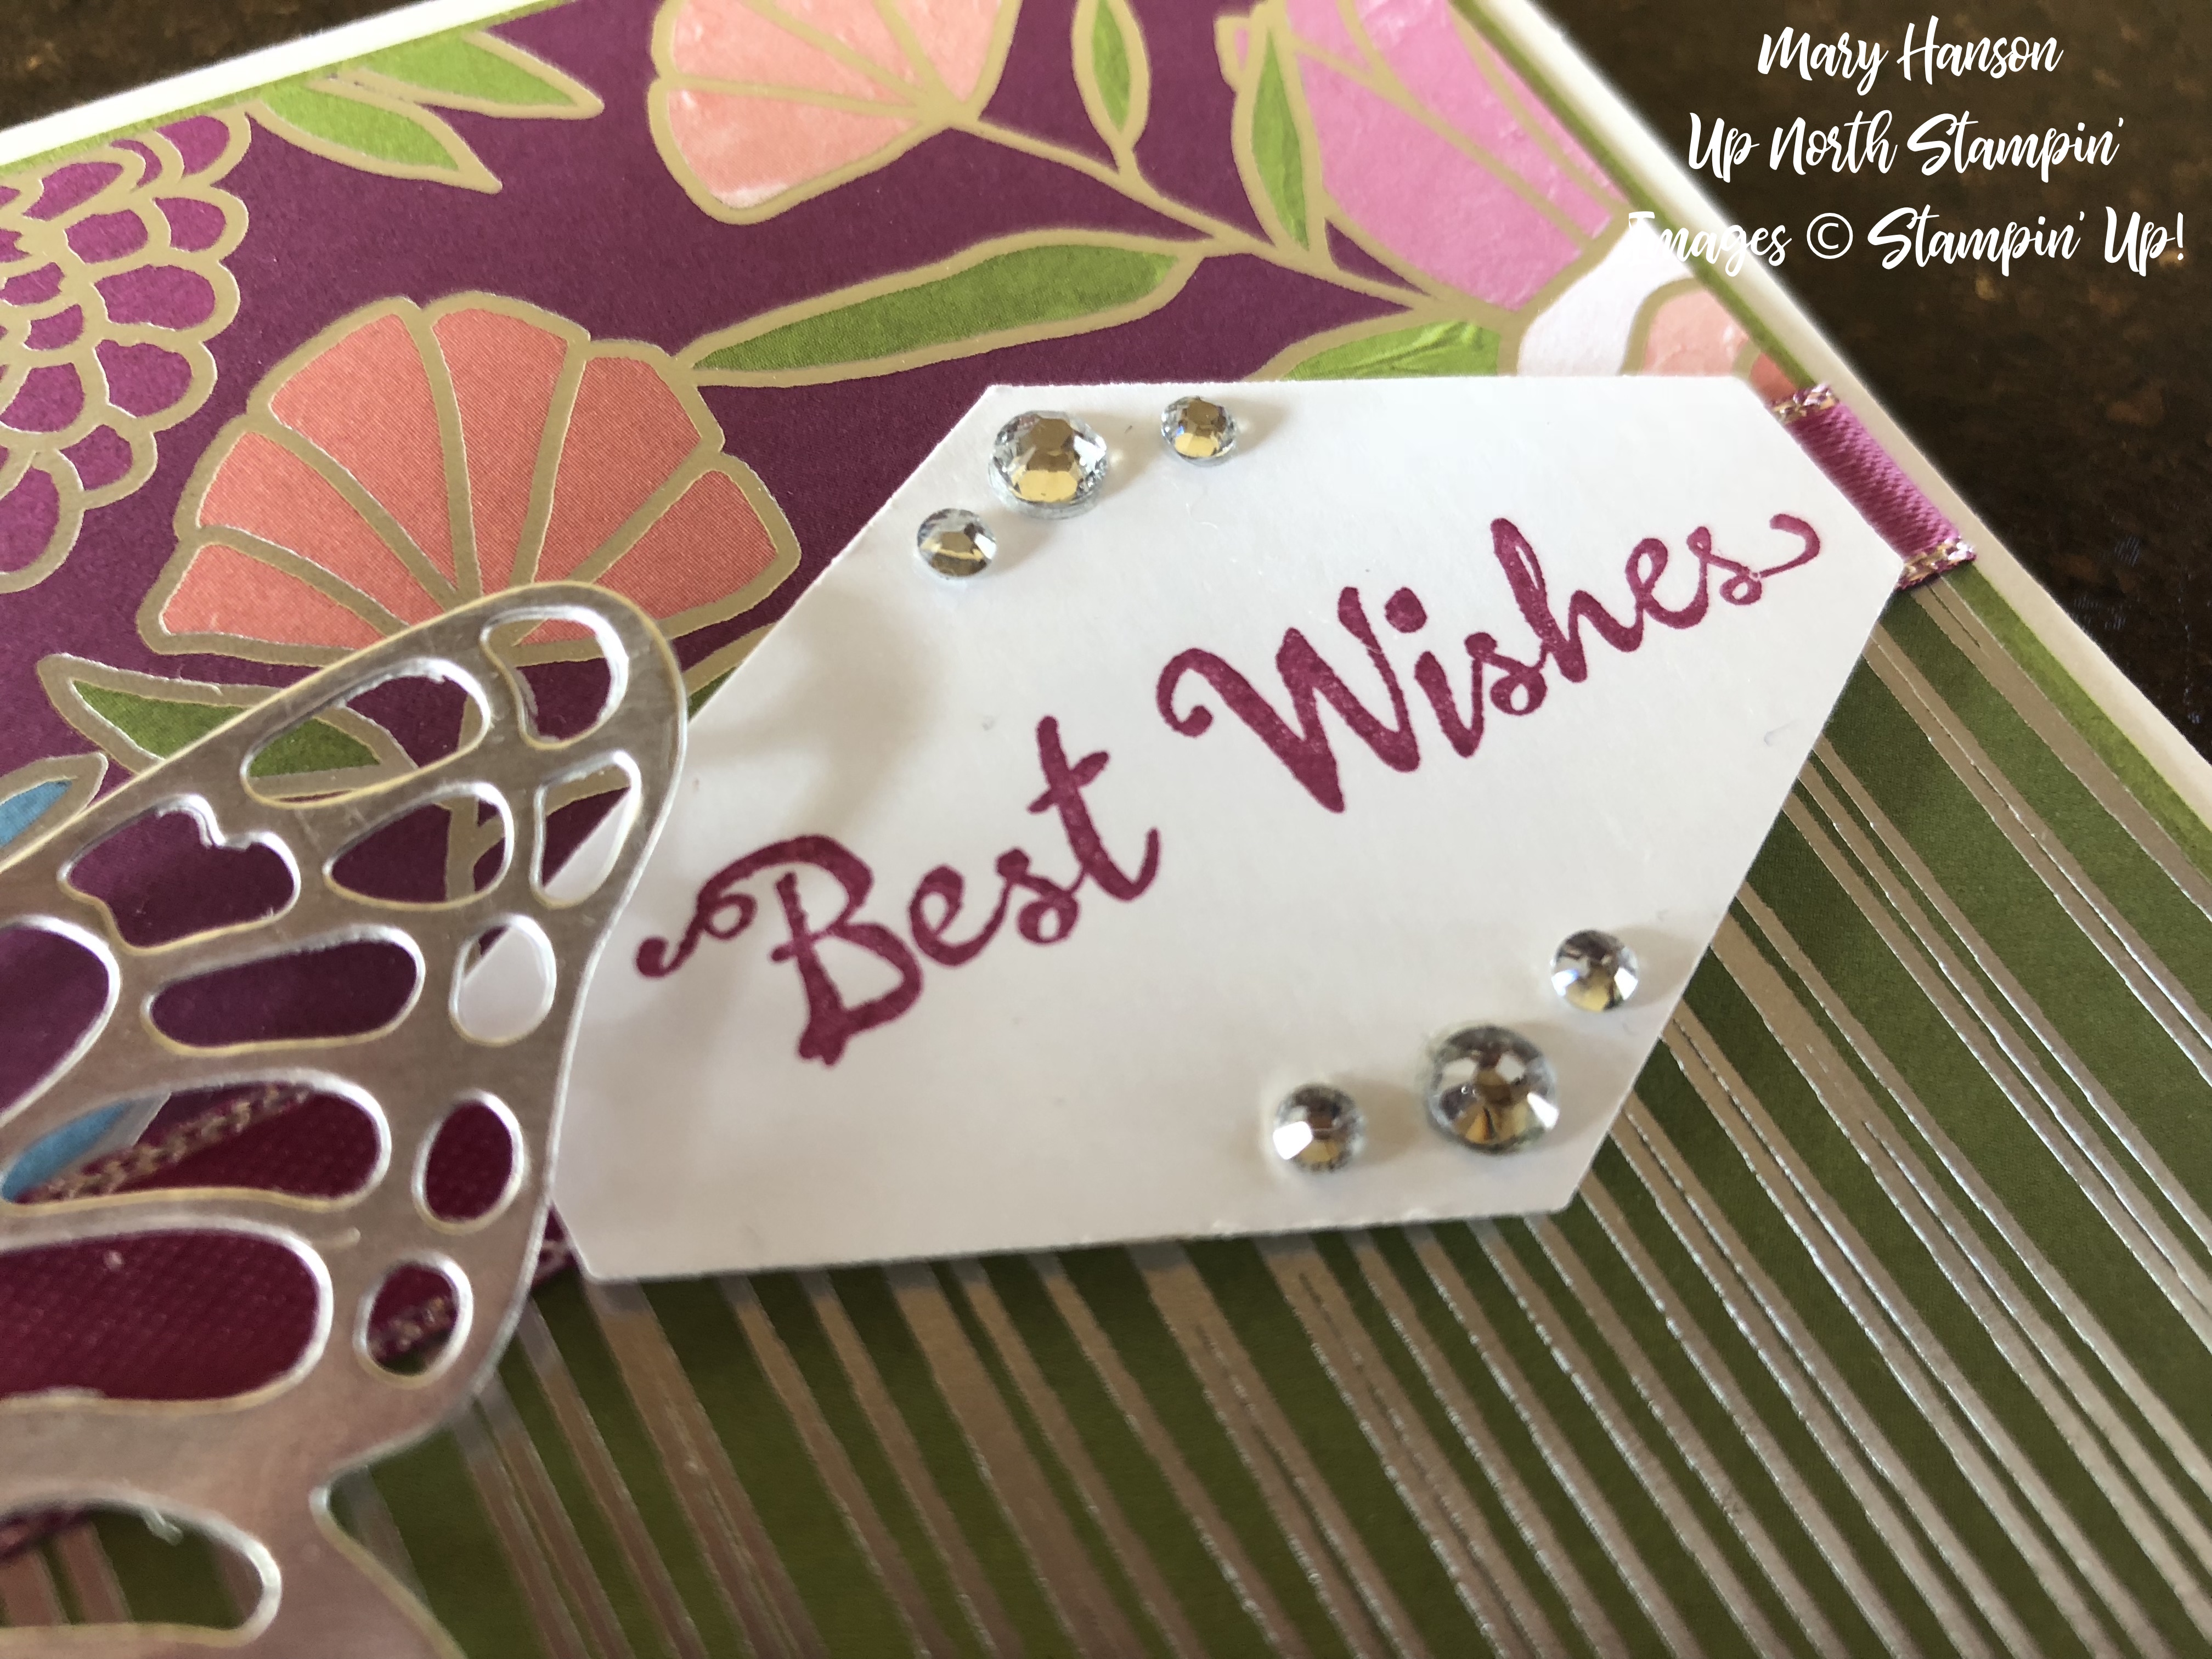 Sweet Soiree Designer Series Paper - Butterflies Thinlits Dies - Up North Stampin' - Mary Hanson